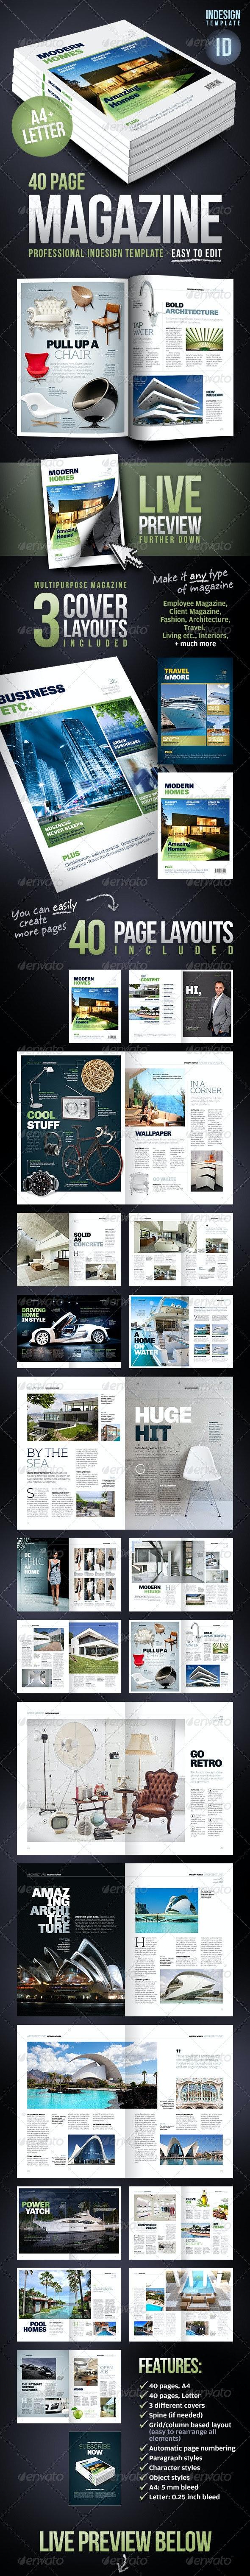 Multipurpose 40 Page Magazine - A4 + Letter - Magazines Print Templates